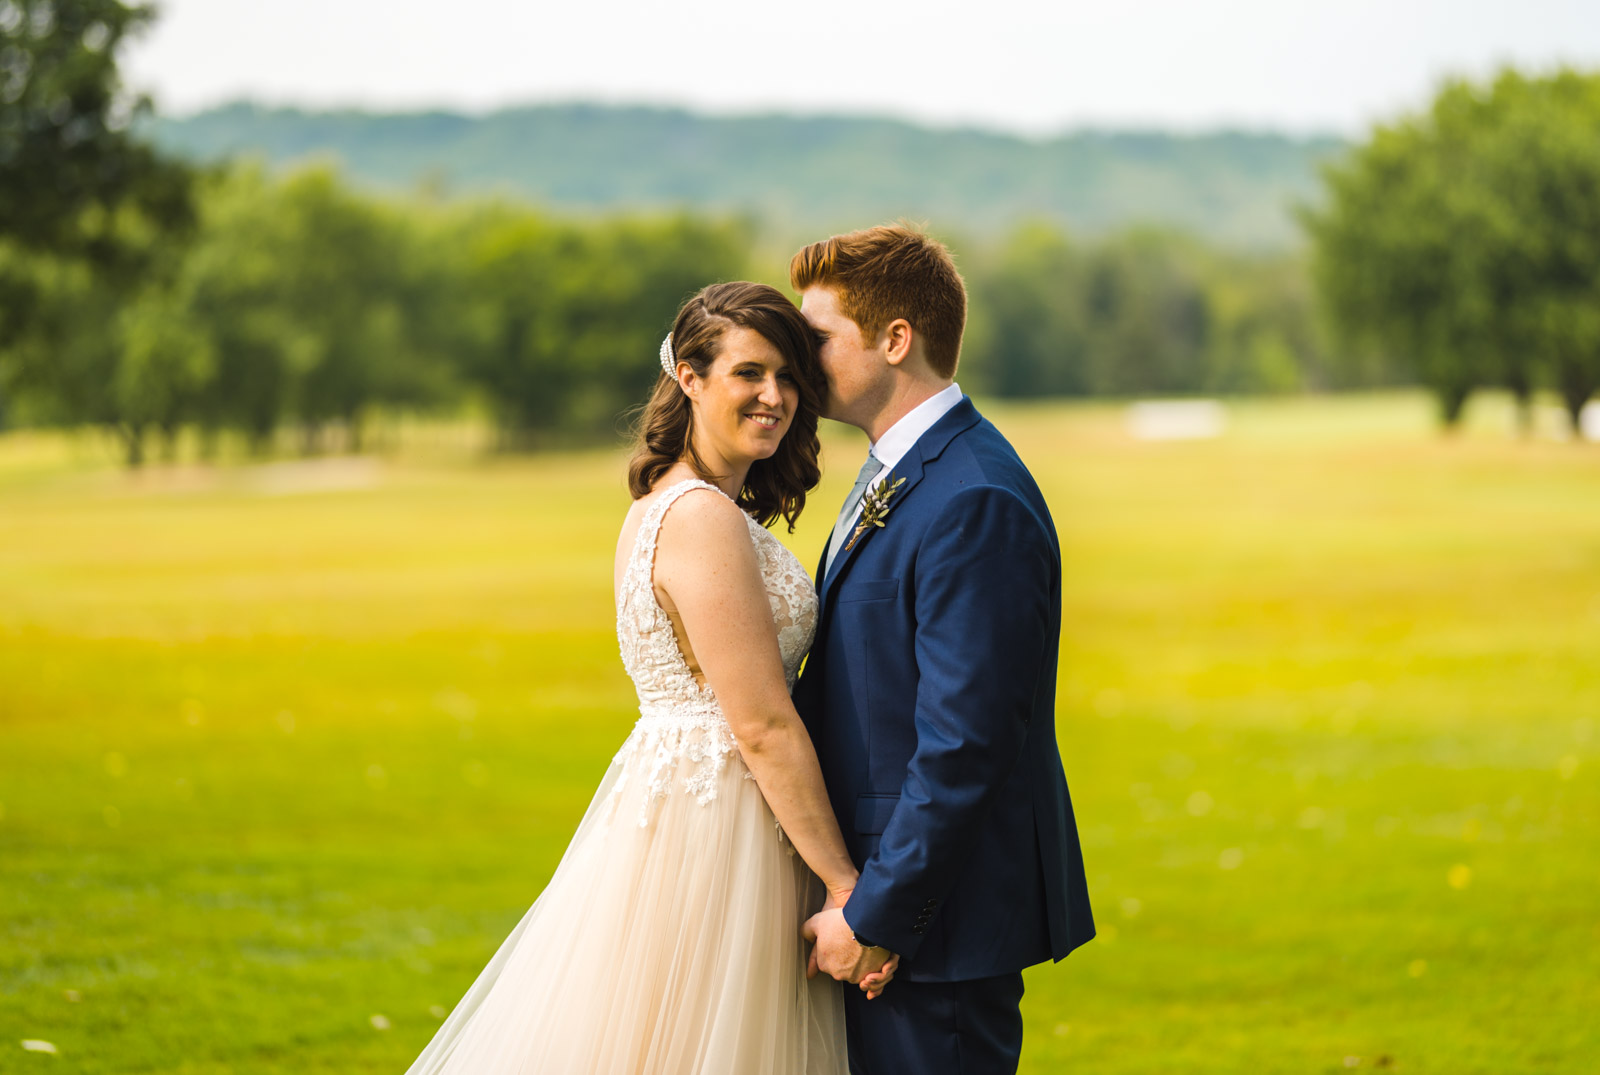 Emerson & Elicia's Golf Course Wedding Aidan & Leanne Hennebry Hamilton Wedding Videographers Photographers Niagara Hush Hush Photography & Film-51.jpg